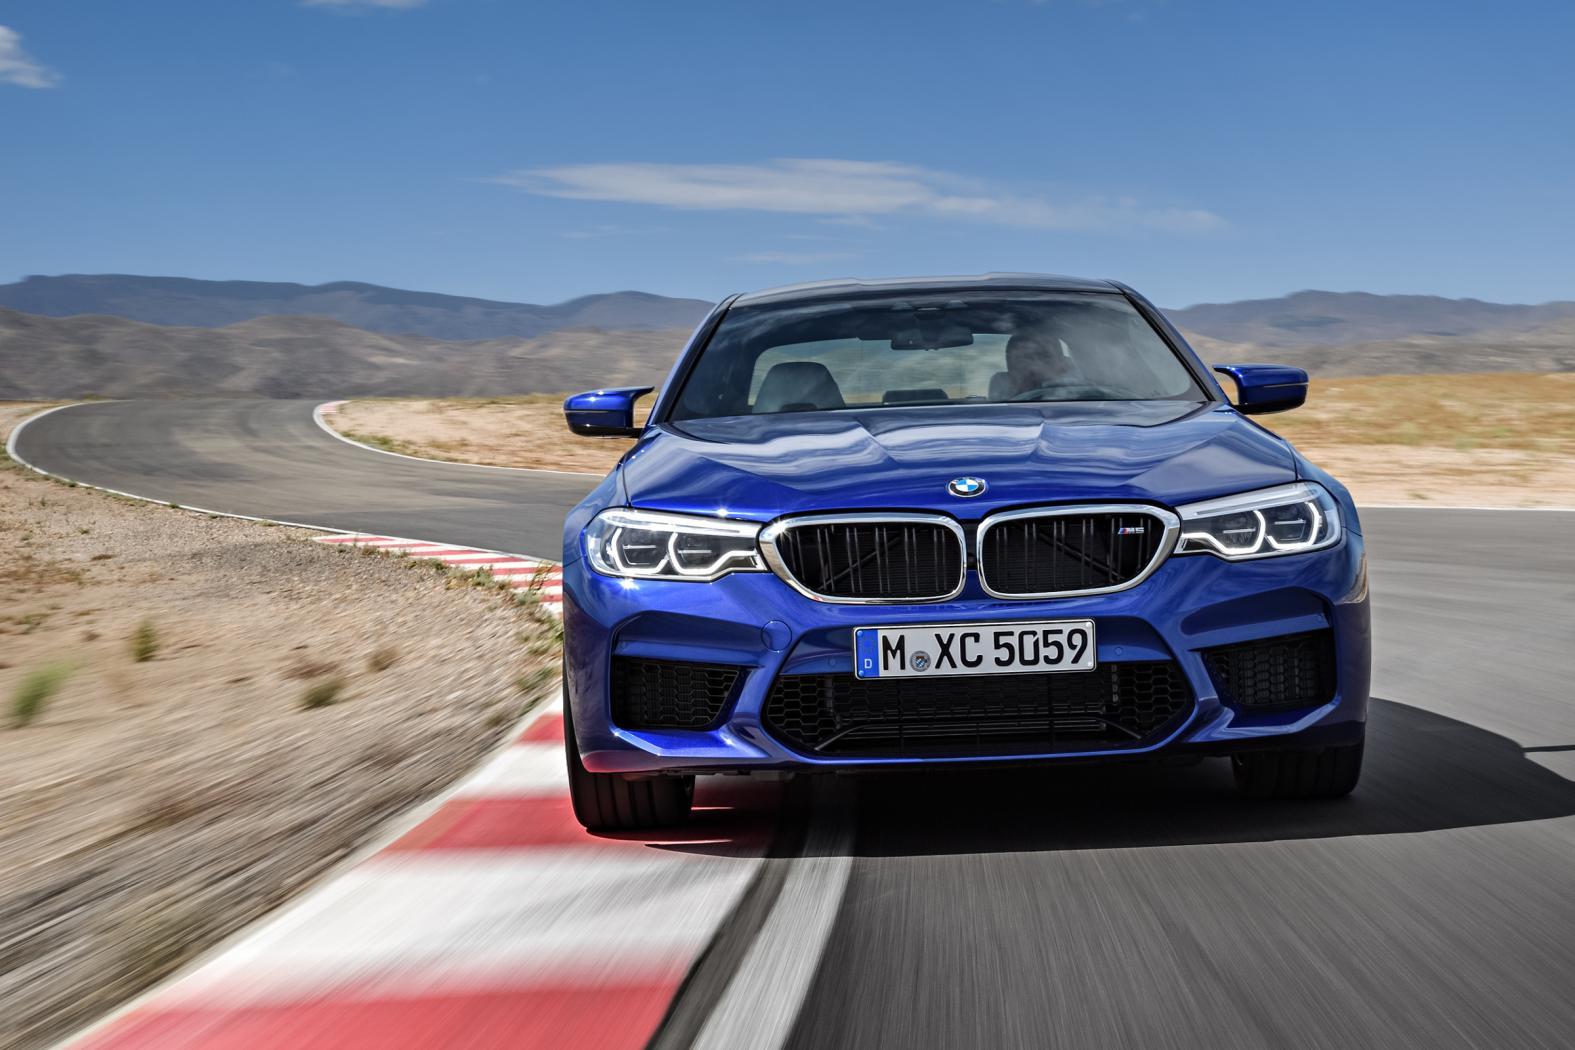 BMW-M5-F90-4.jpeg